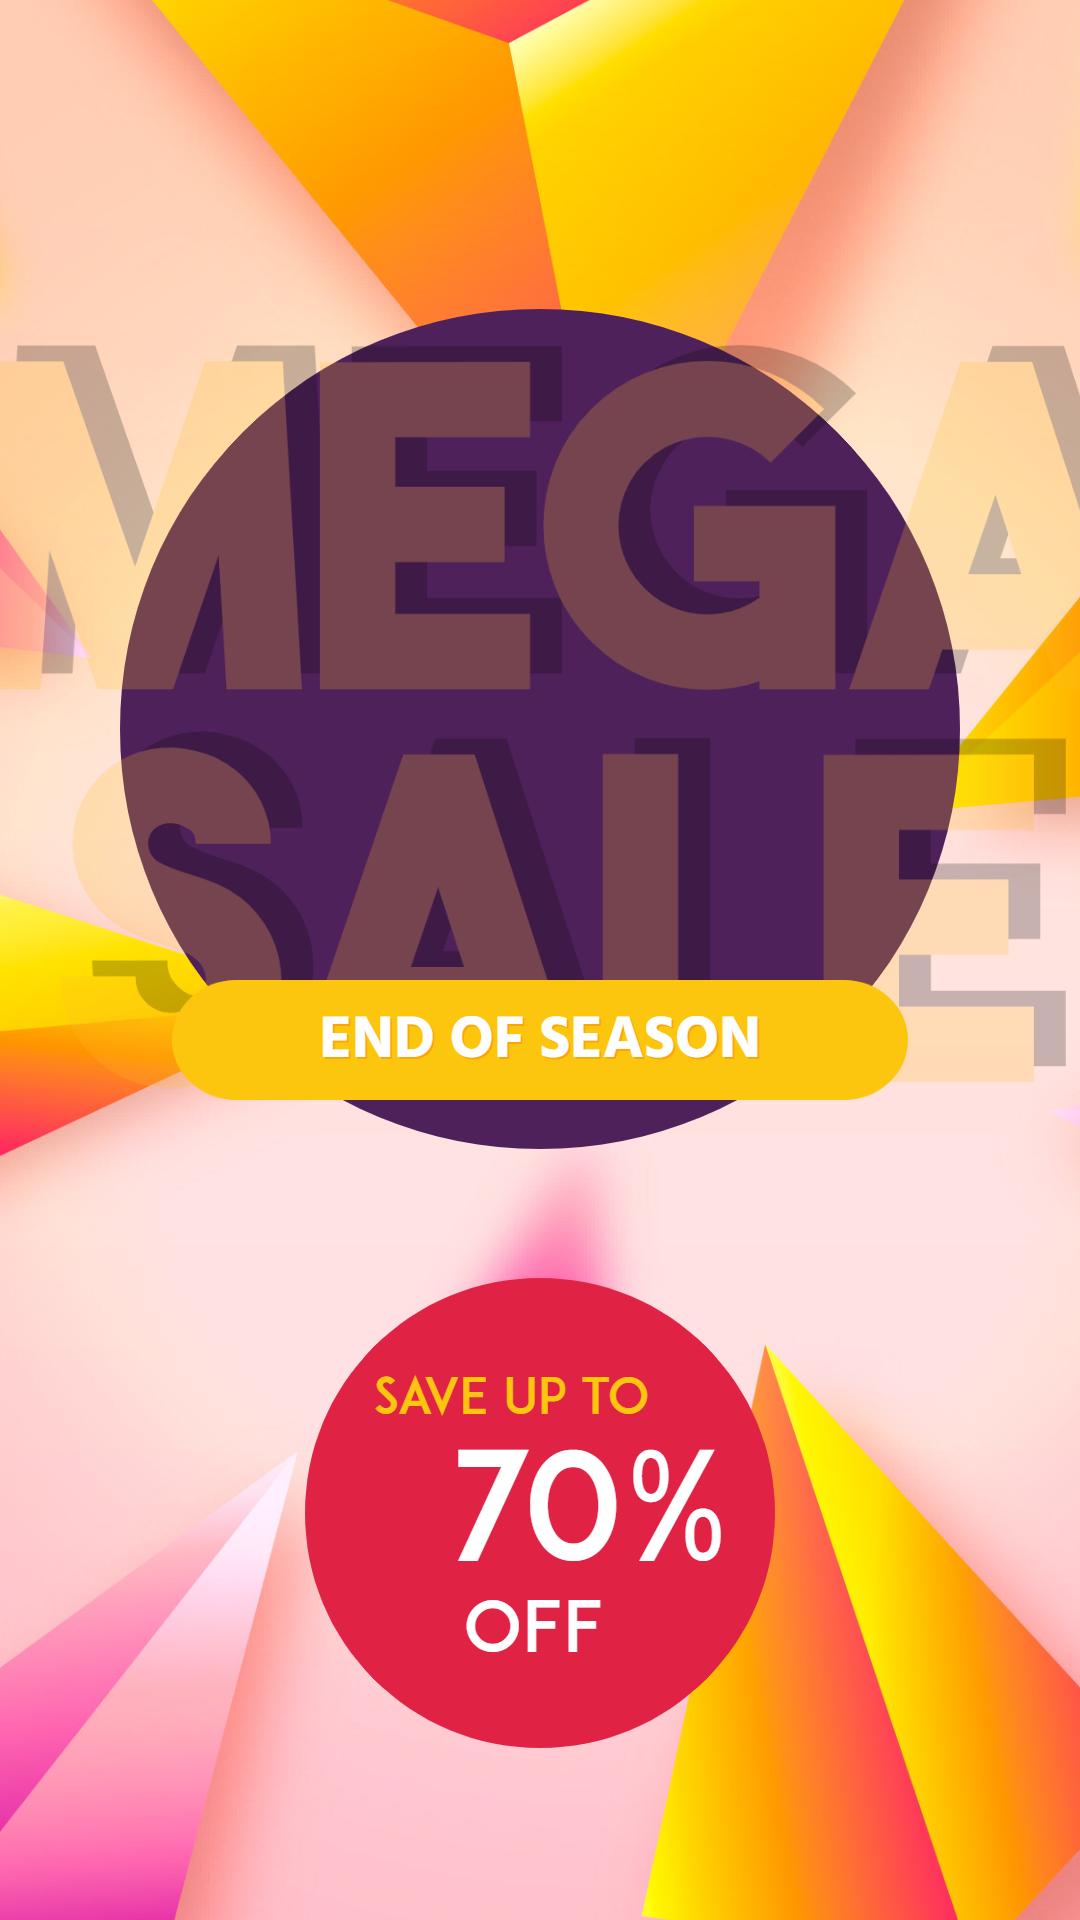 Mega Sale End of Season Banner Animation  Template